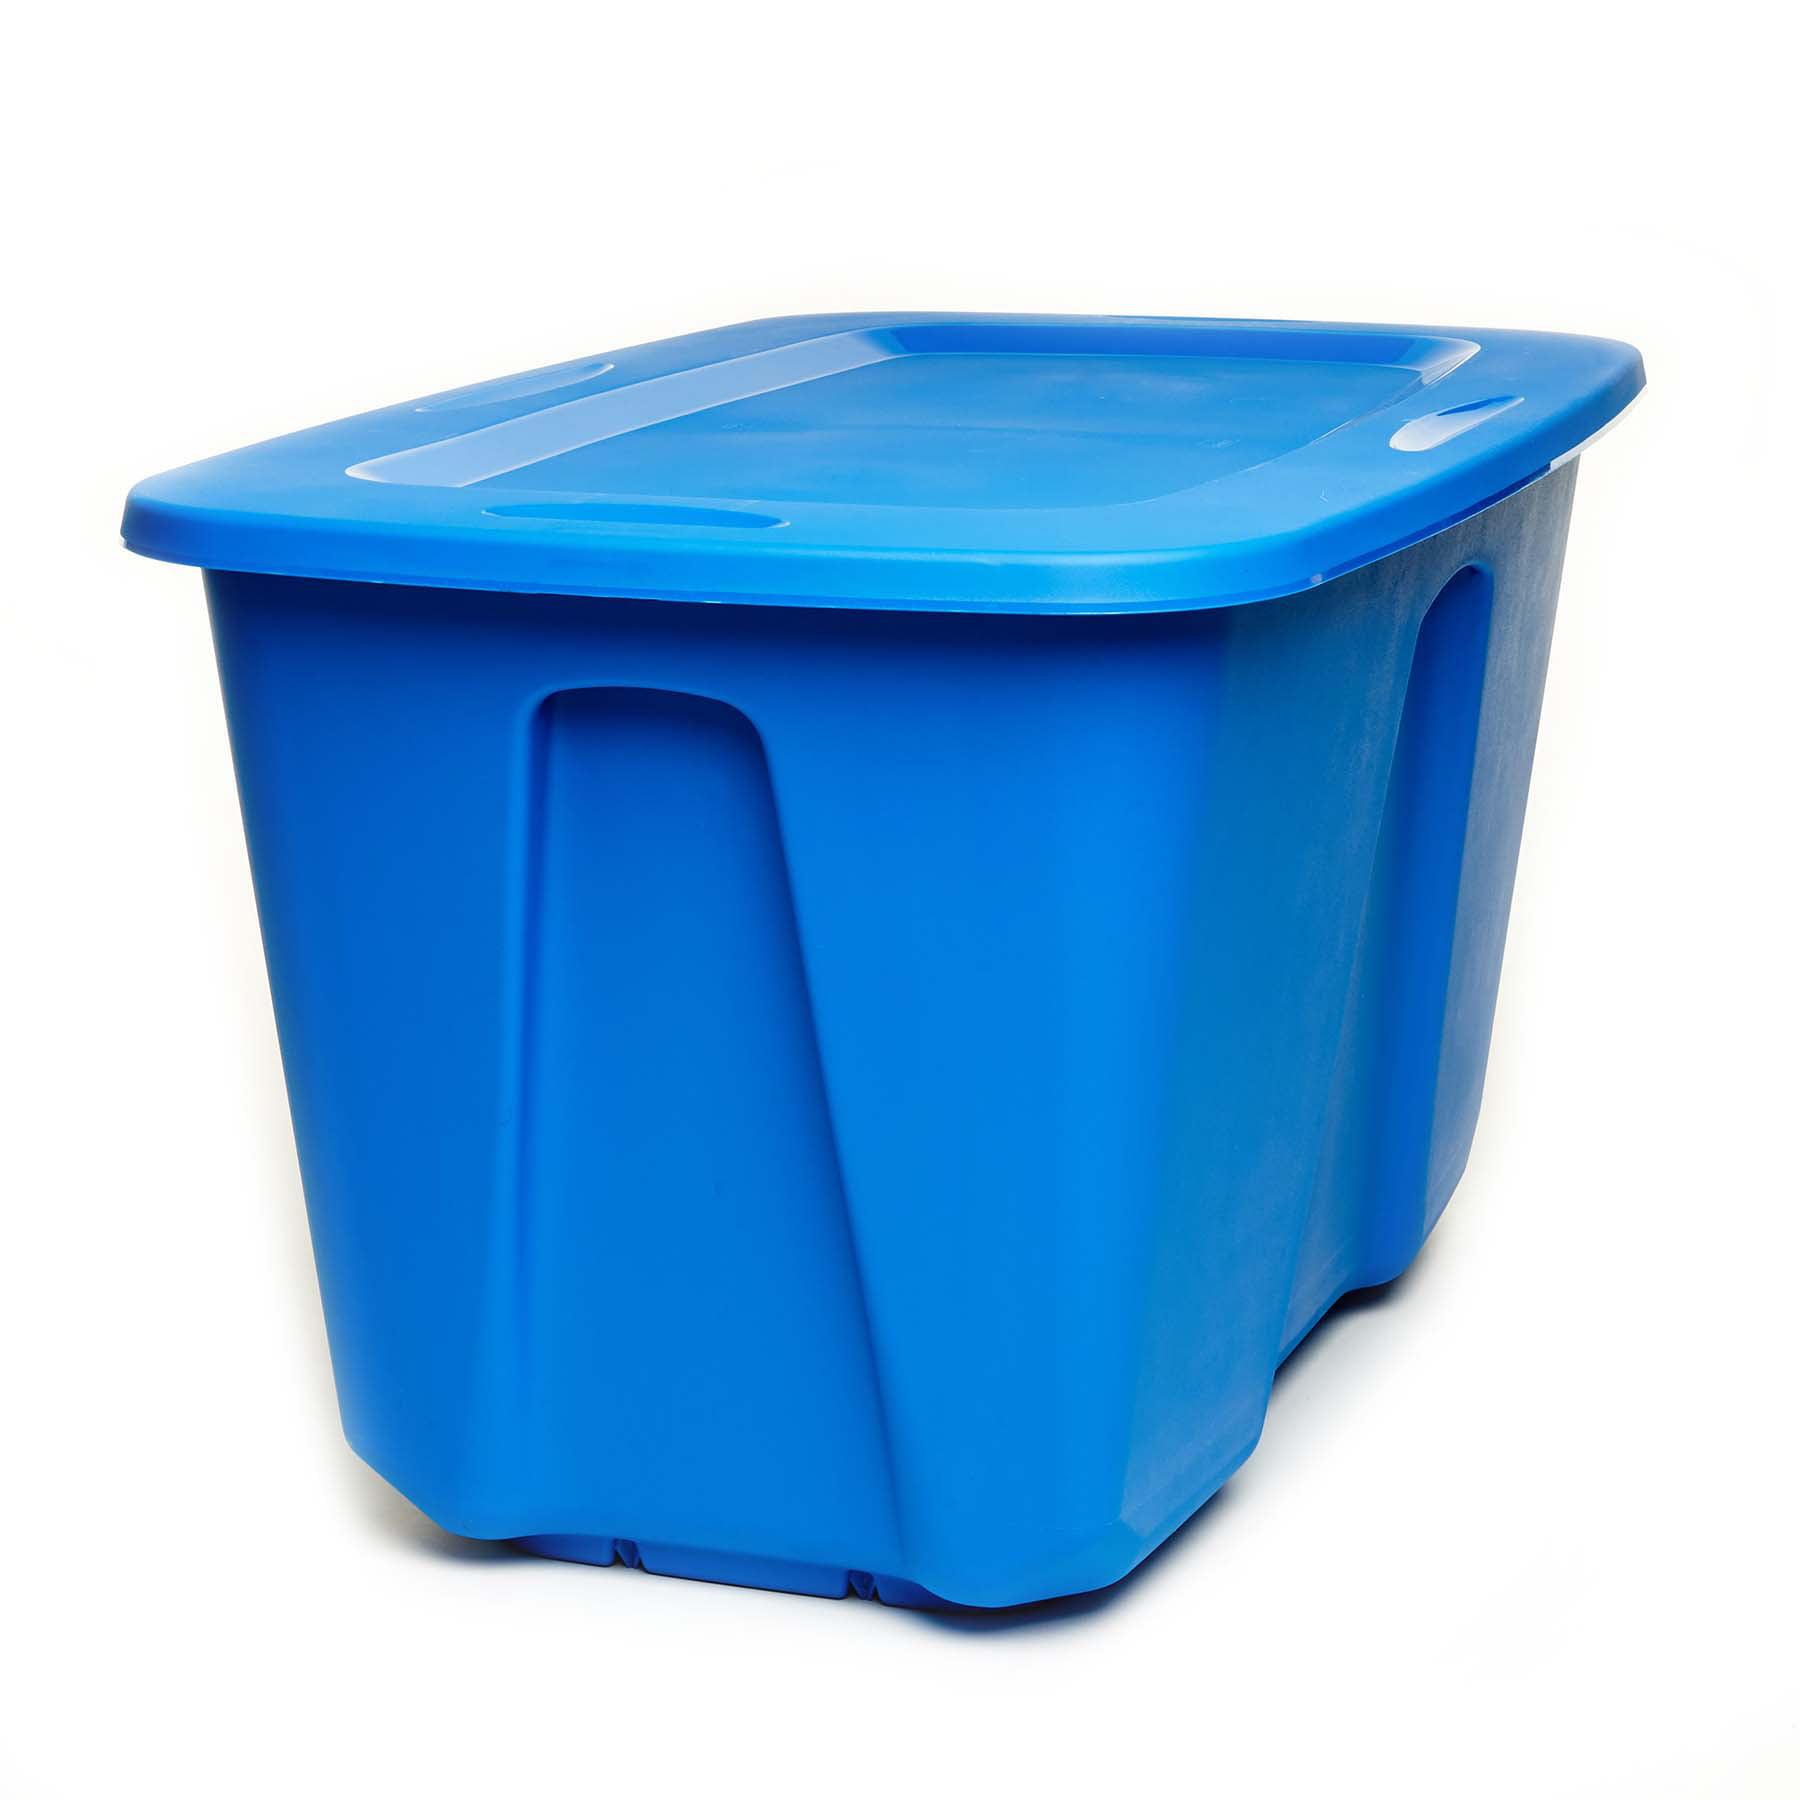 Homz 32 Gallon Storage Container, Royal Blue - Set of 2